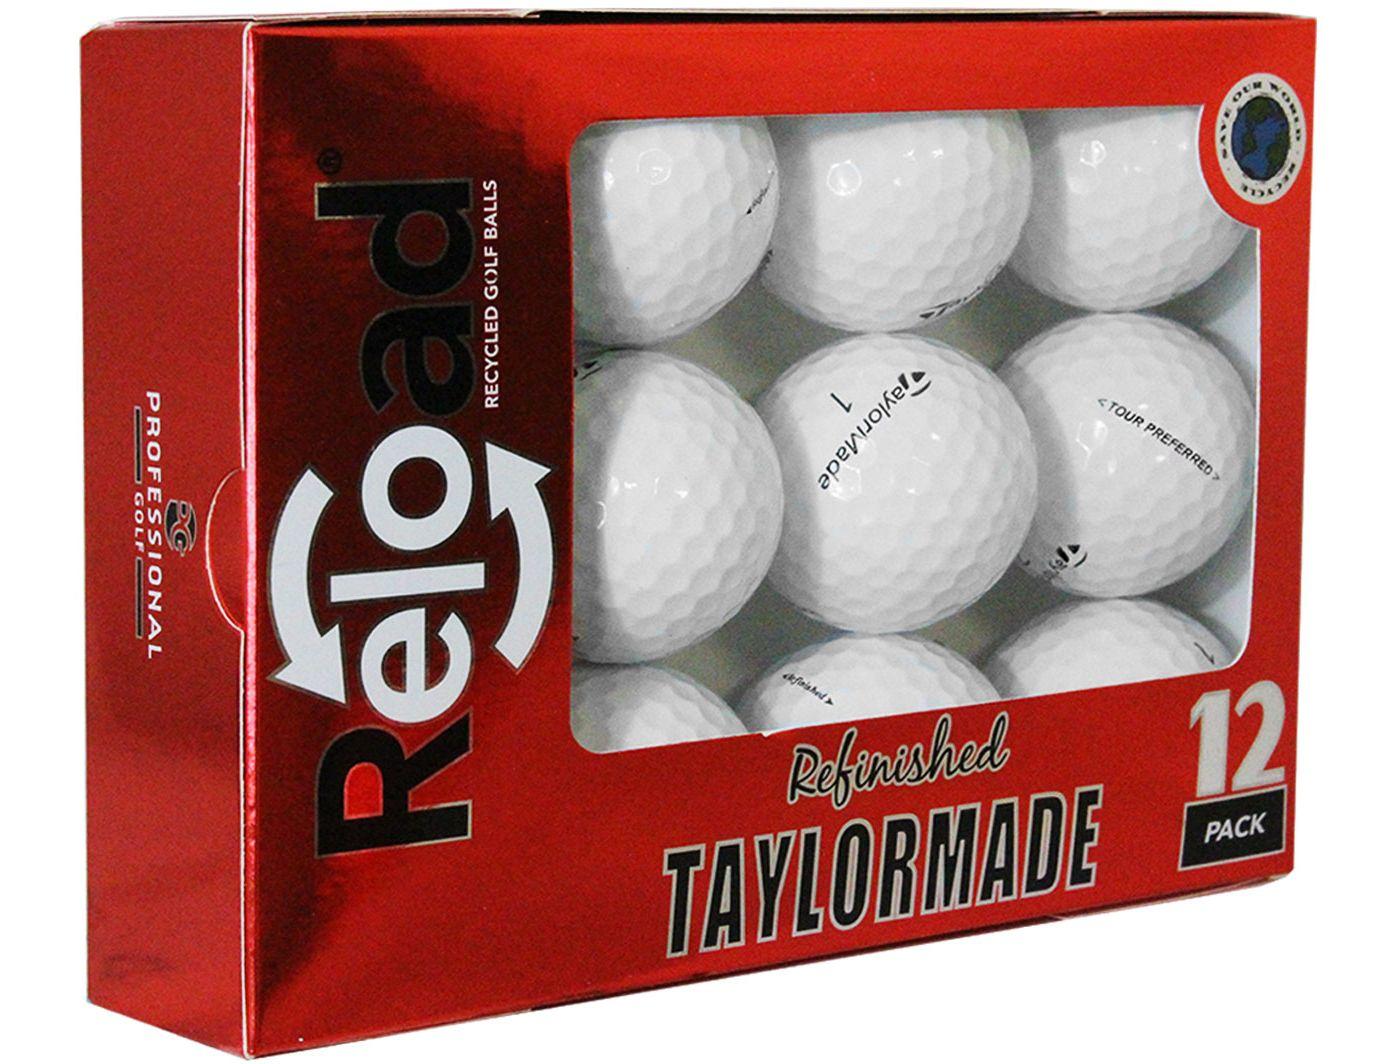 Refurbished TaylorMade Tour Preferred Golf Balls